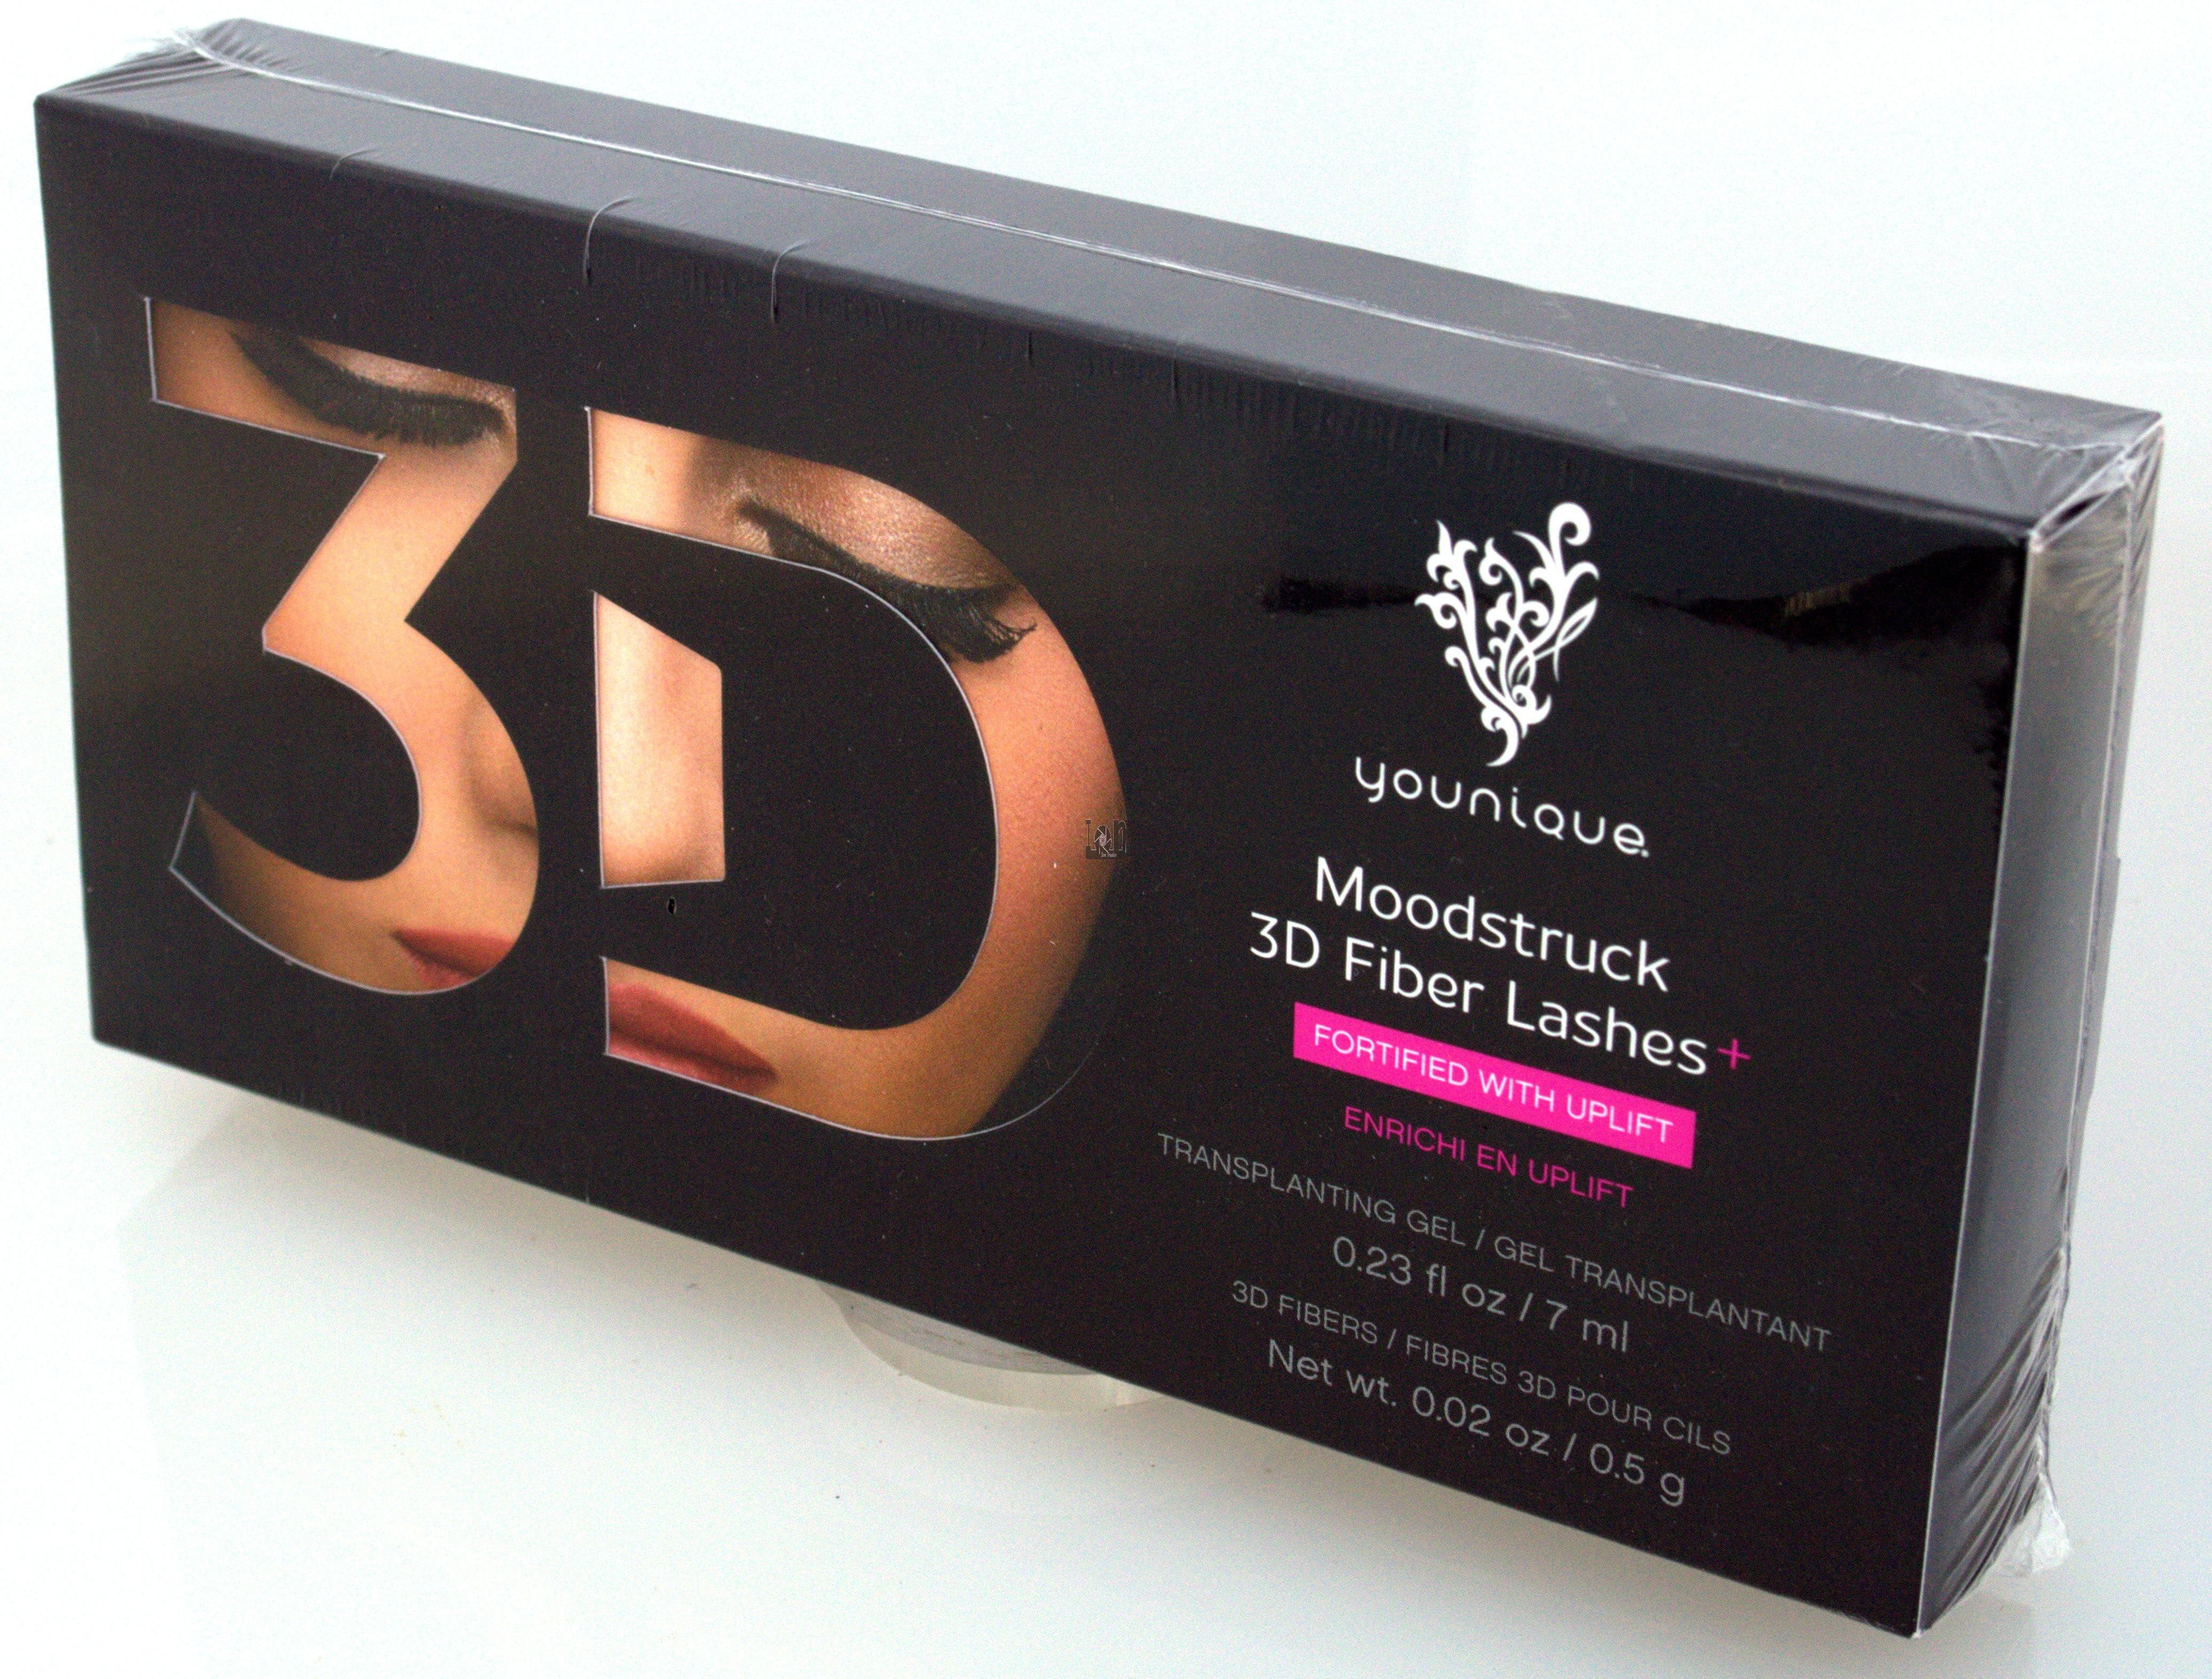 Younique 3D Fiber Lashes Moonstruck Mascara Sealed Pack